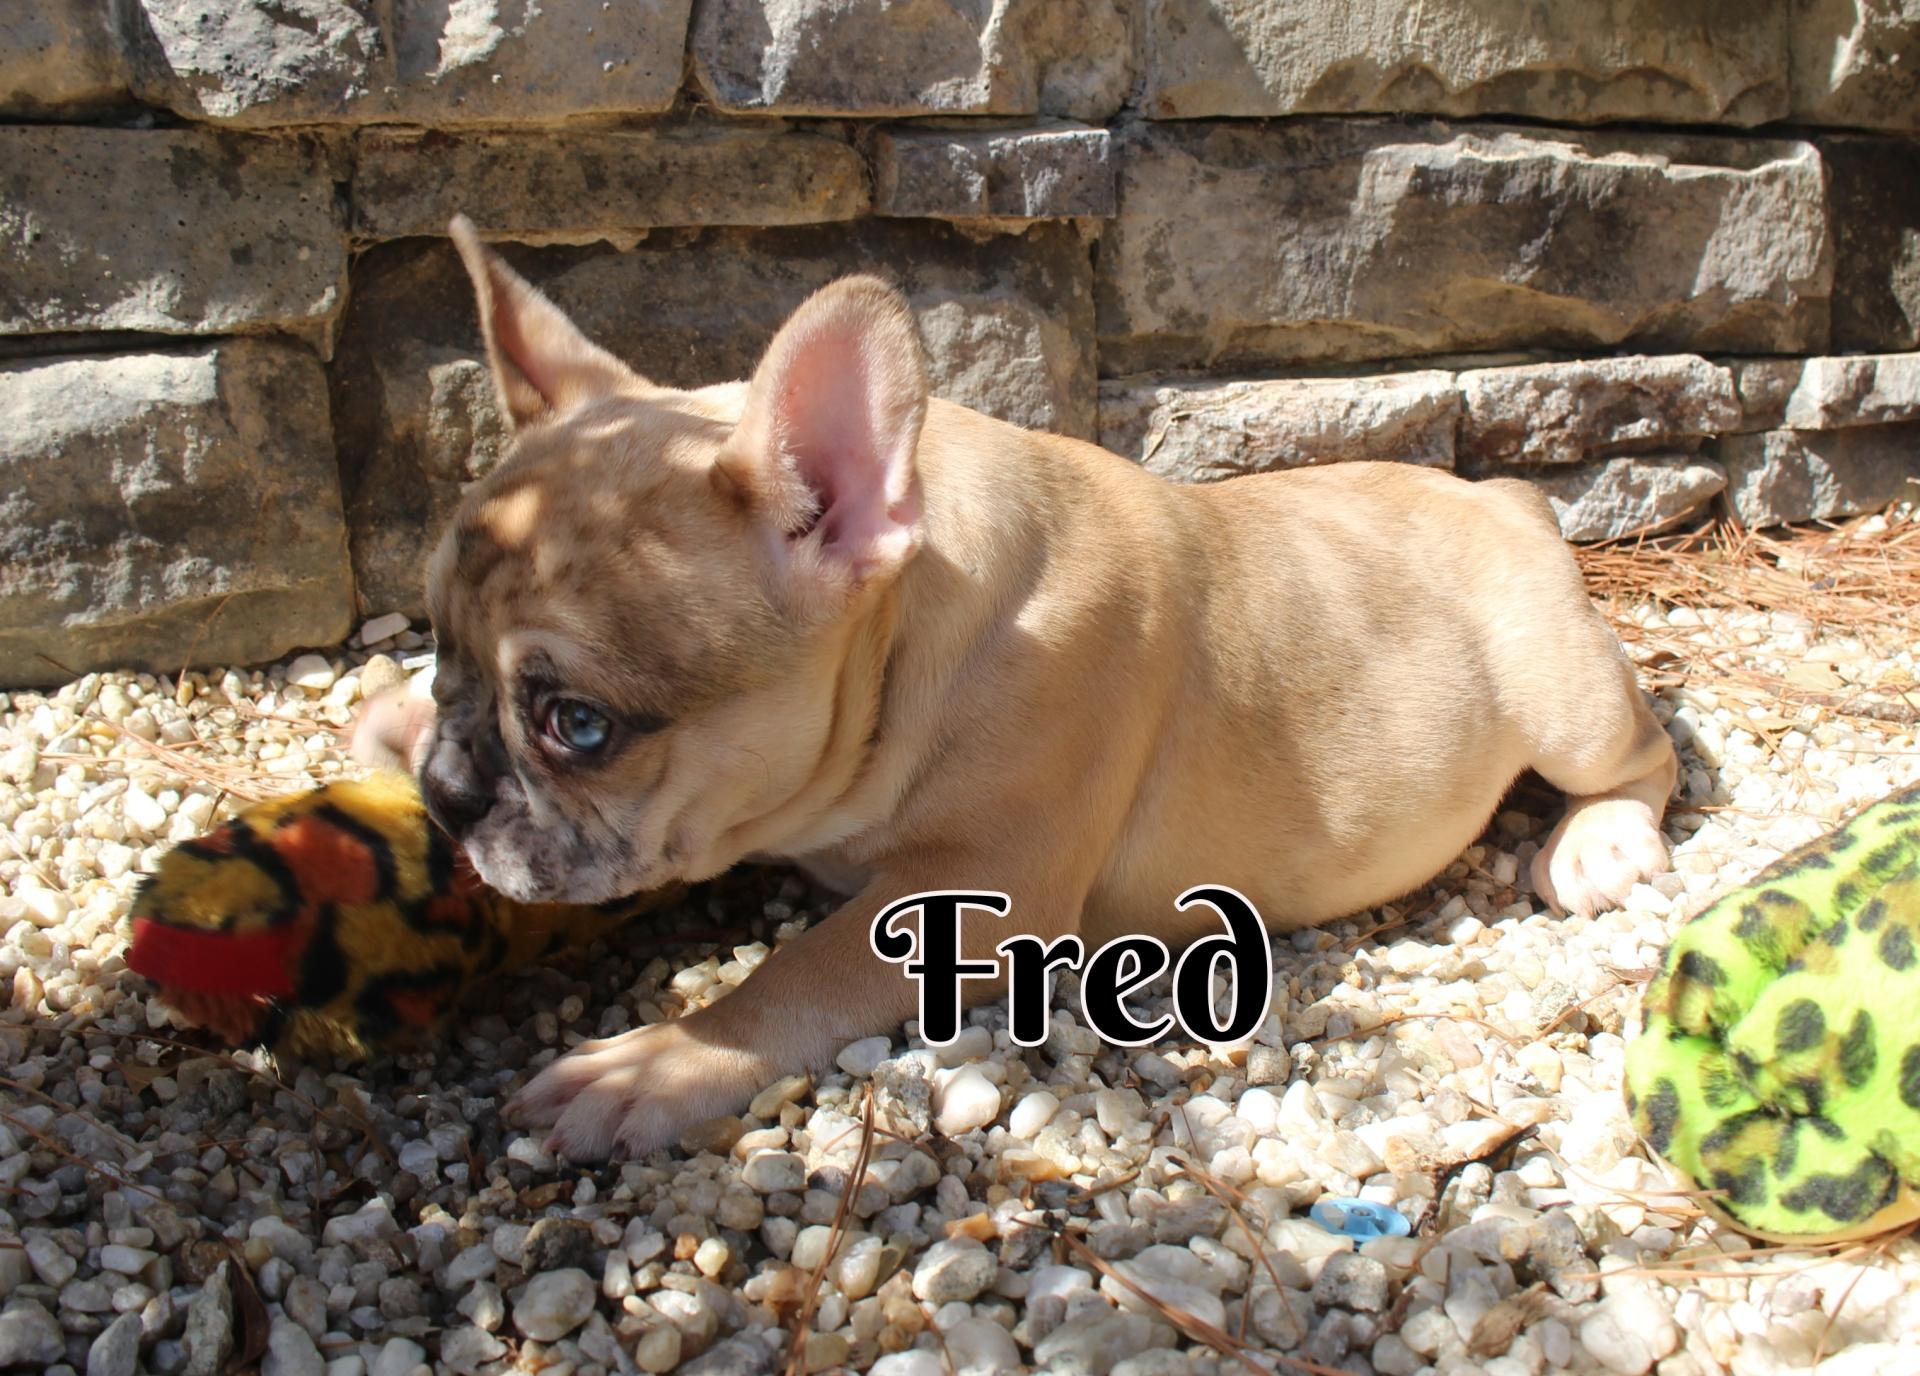 #FrenchBulldogPuppies #MerleFrenchBulldog #Frenchie #AvailablePuppies #AKCRegFrenchBulldog #SouthernTerritoryFrenchies